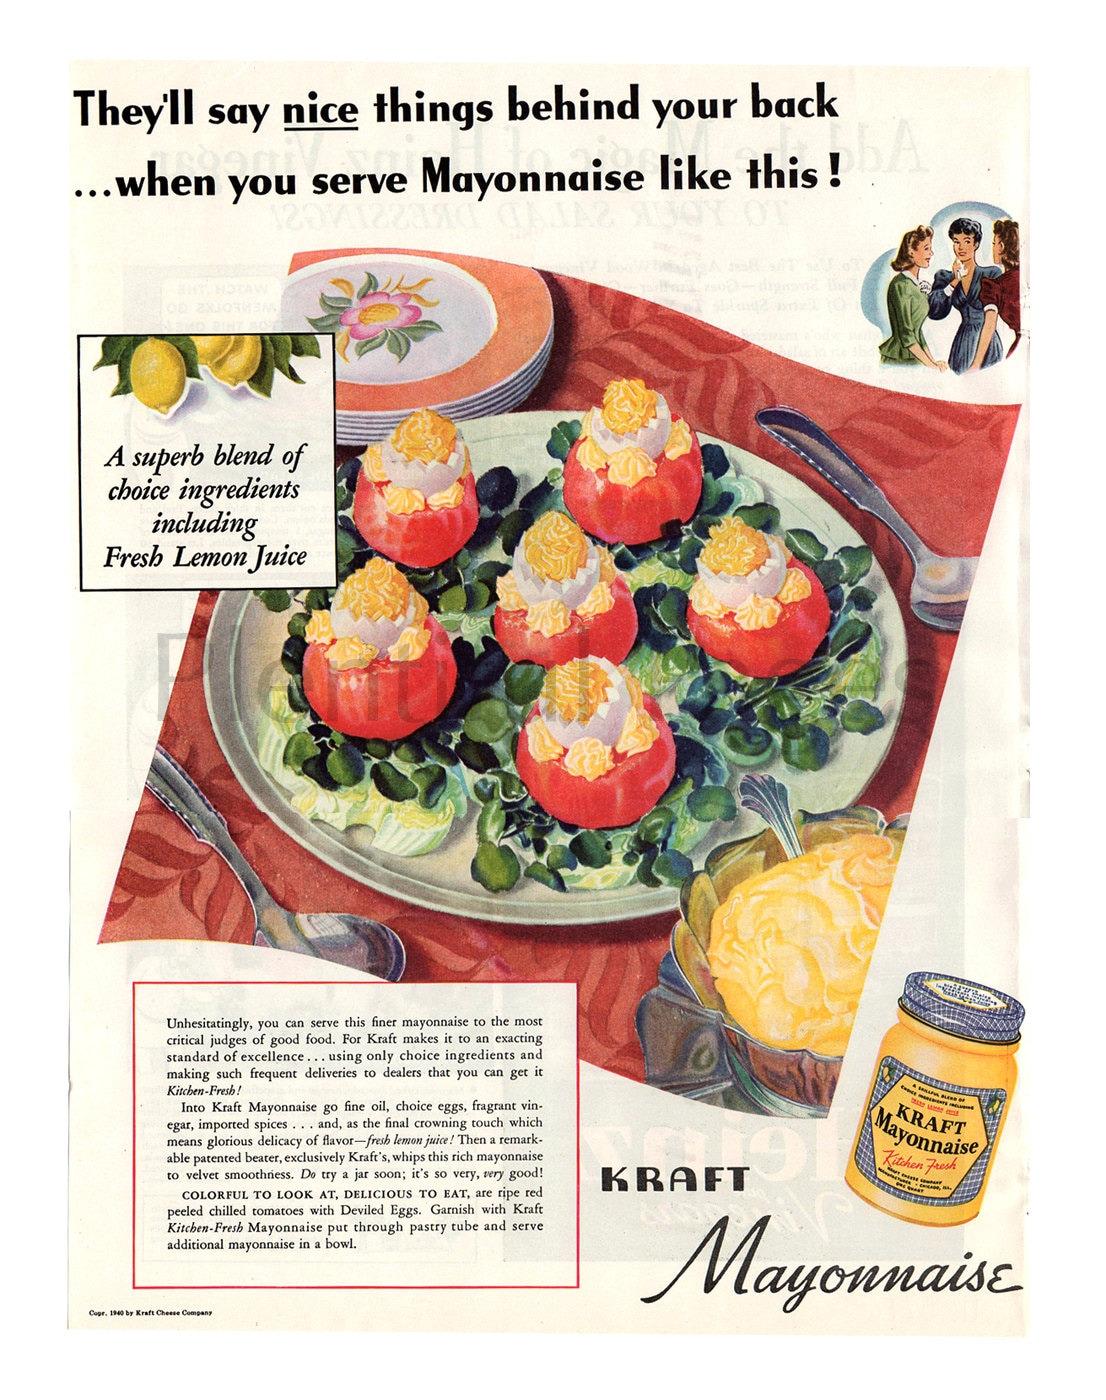 1940 Kraft Mayonnaise Vintage Ad 1940\'s Lunch Vintage   Etsy